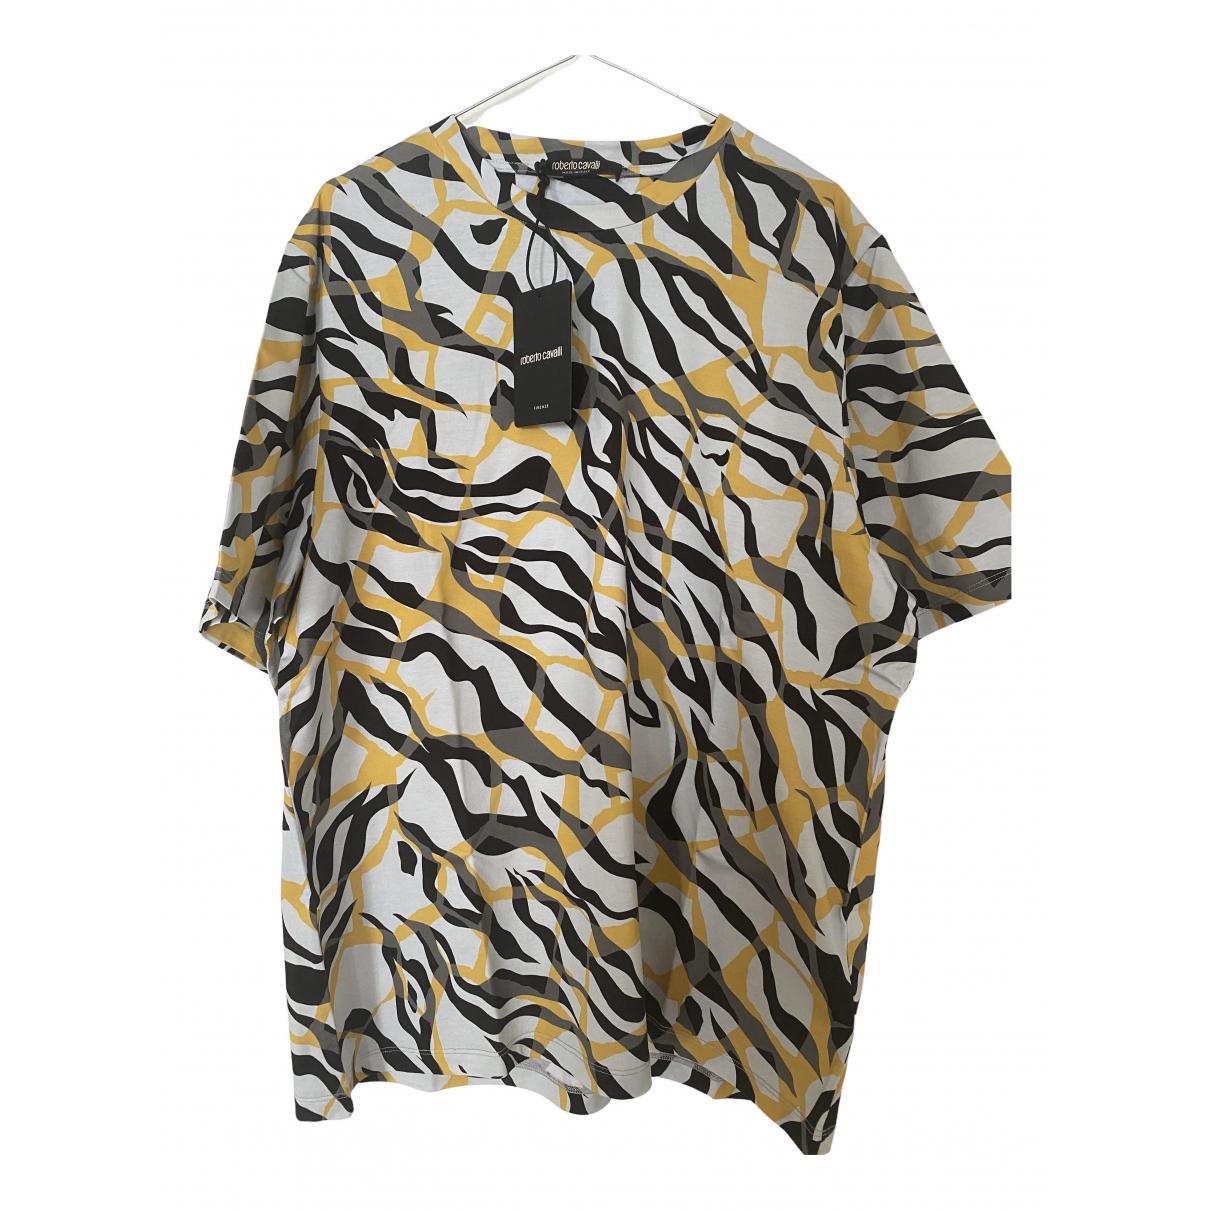 Roberto Cavalli \N T-shirts for Men XL International